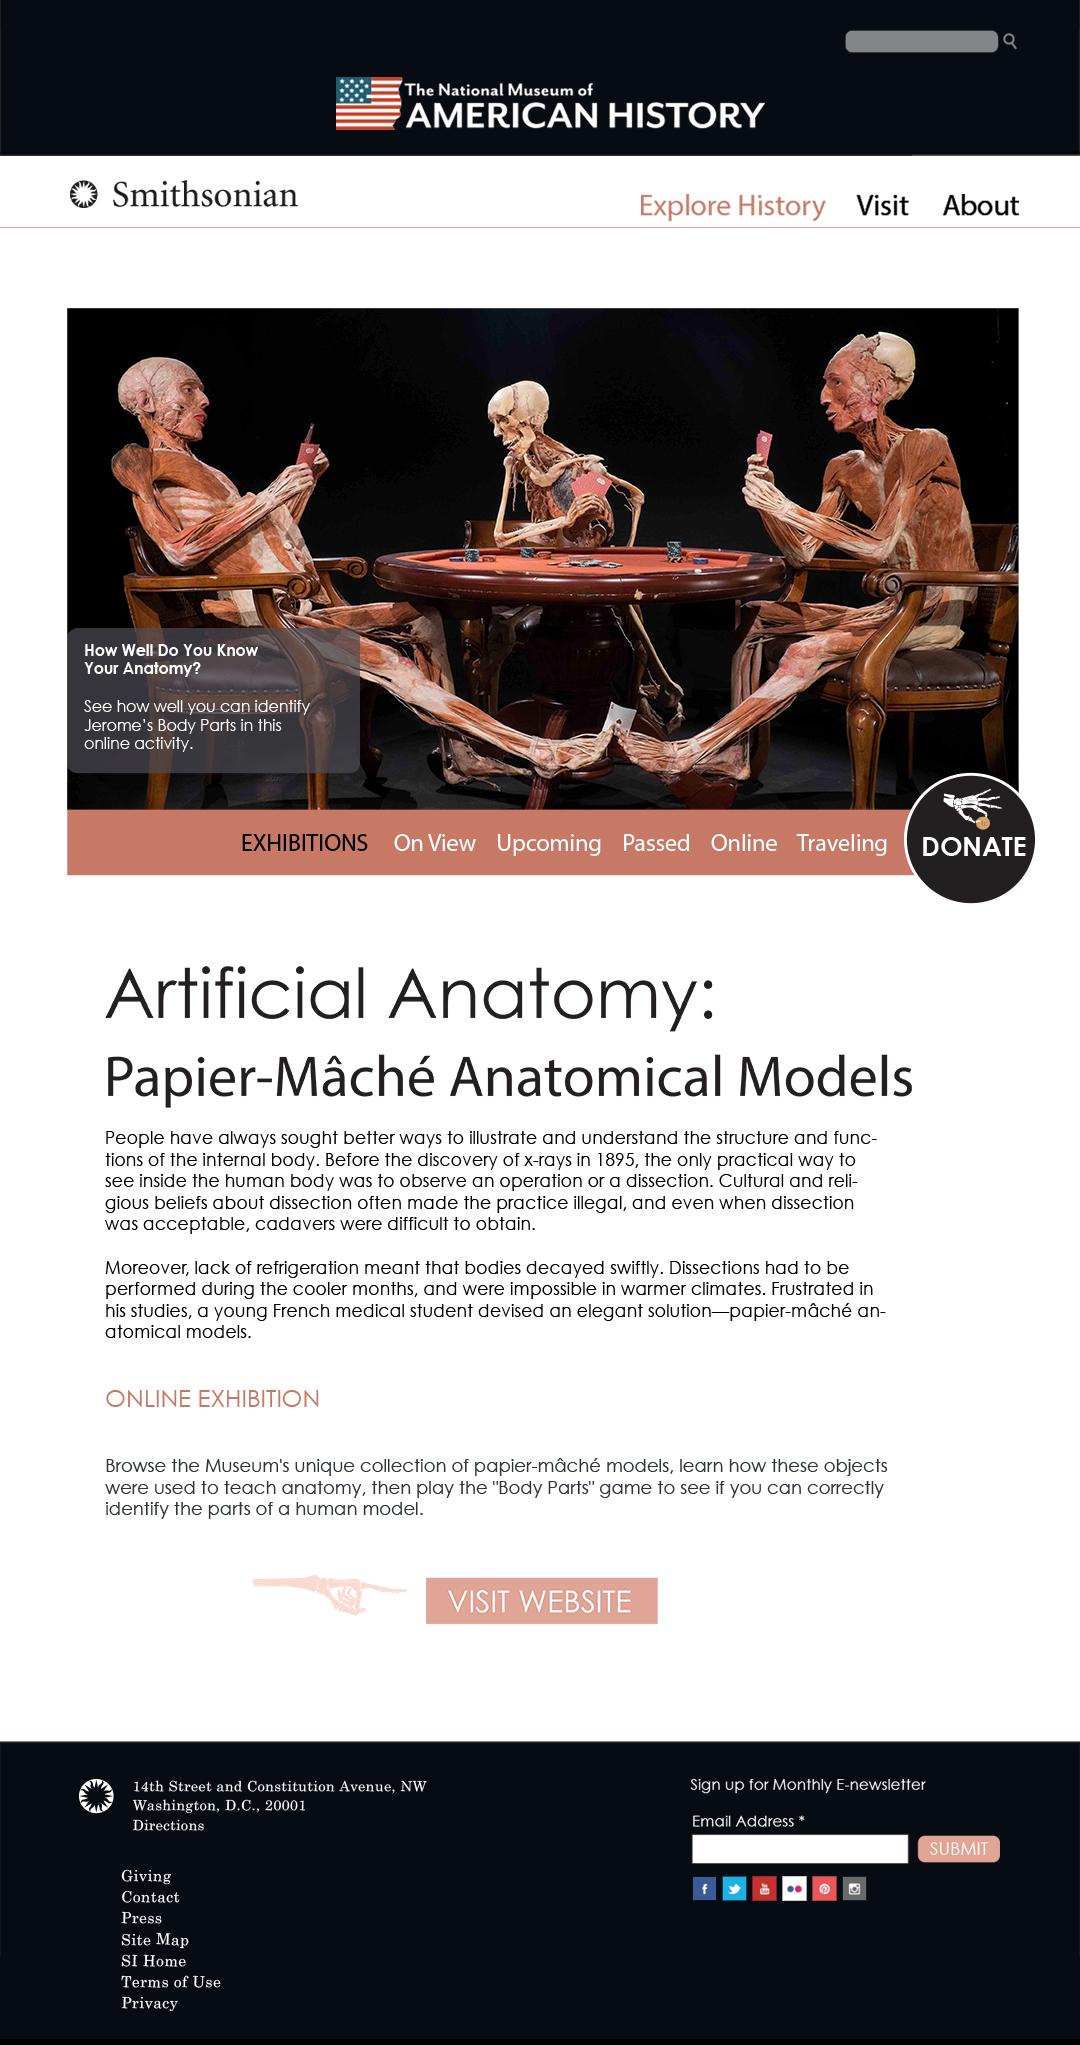 abby huss - Artificial Anatomy